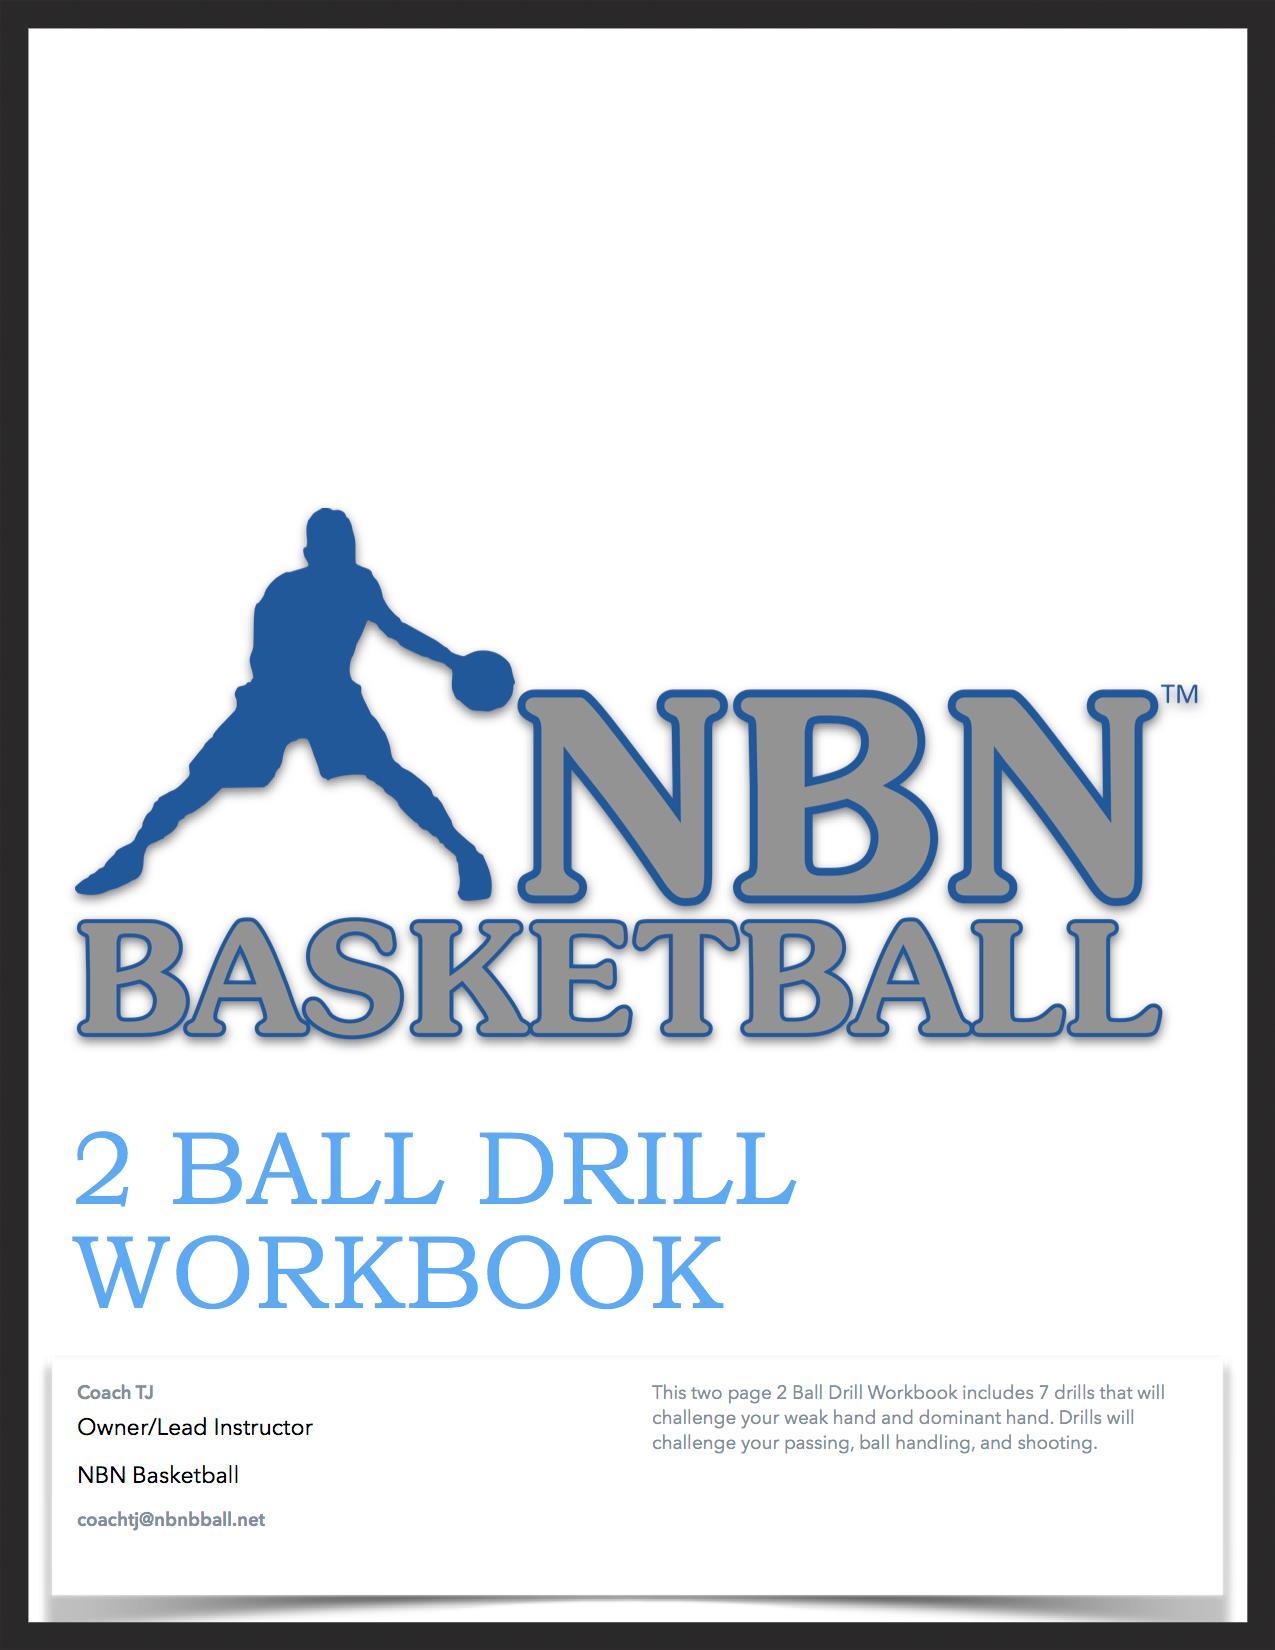 2 Ball Drill Workbook Cover.jpg